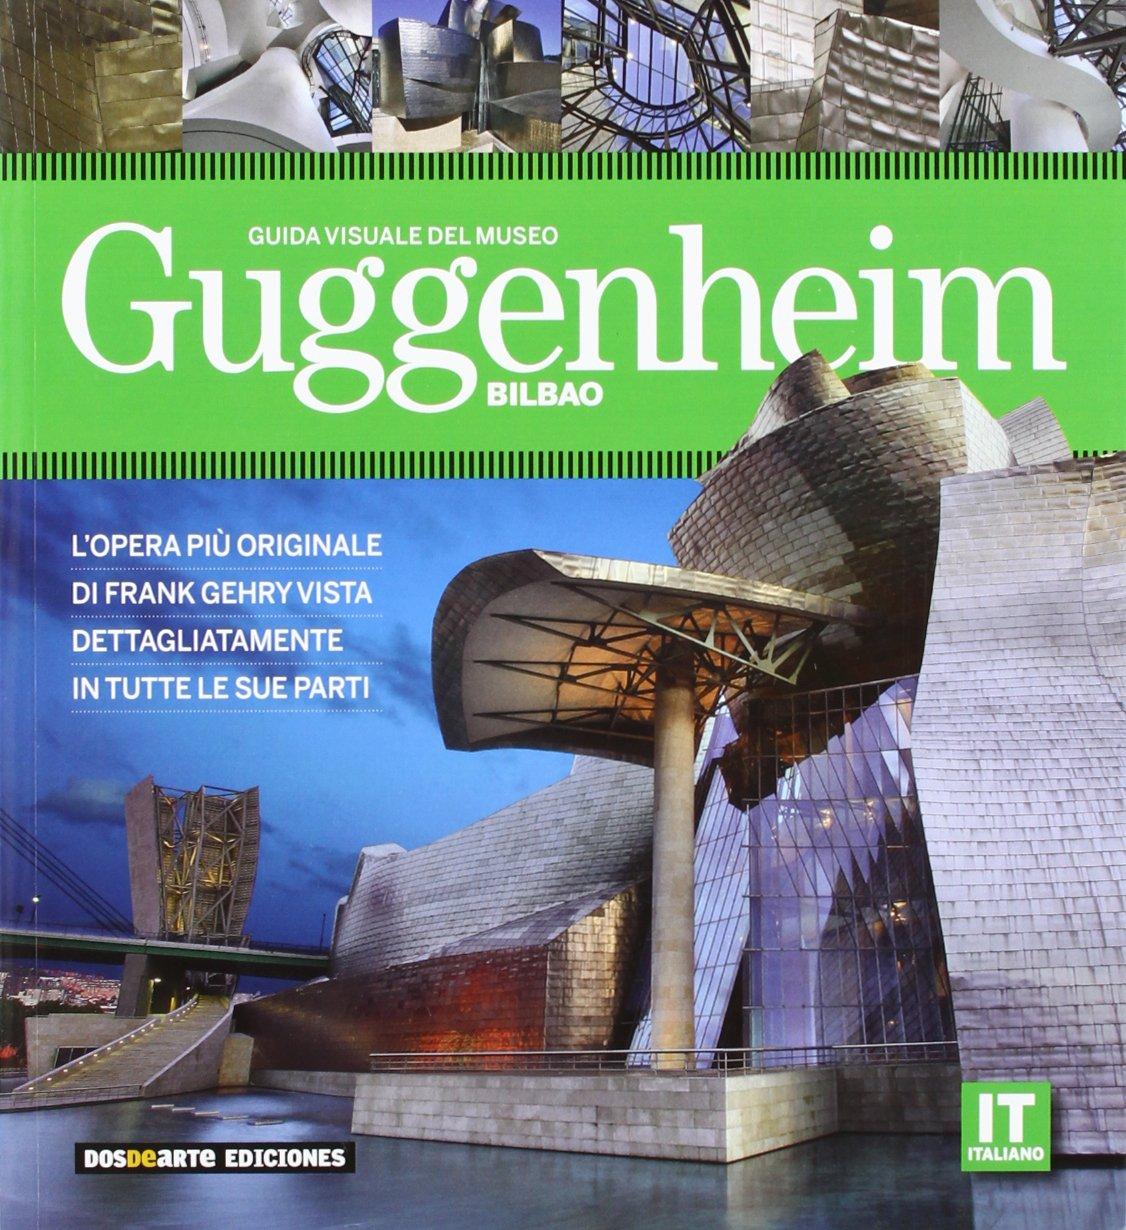 Museo Guggenheim Bilbao - Guia Visual (ita) Copertina flessibile – 10 mag 2011 Aa.Vv. Dos De Arte Ediciones 8496783715 Architecture